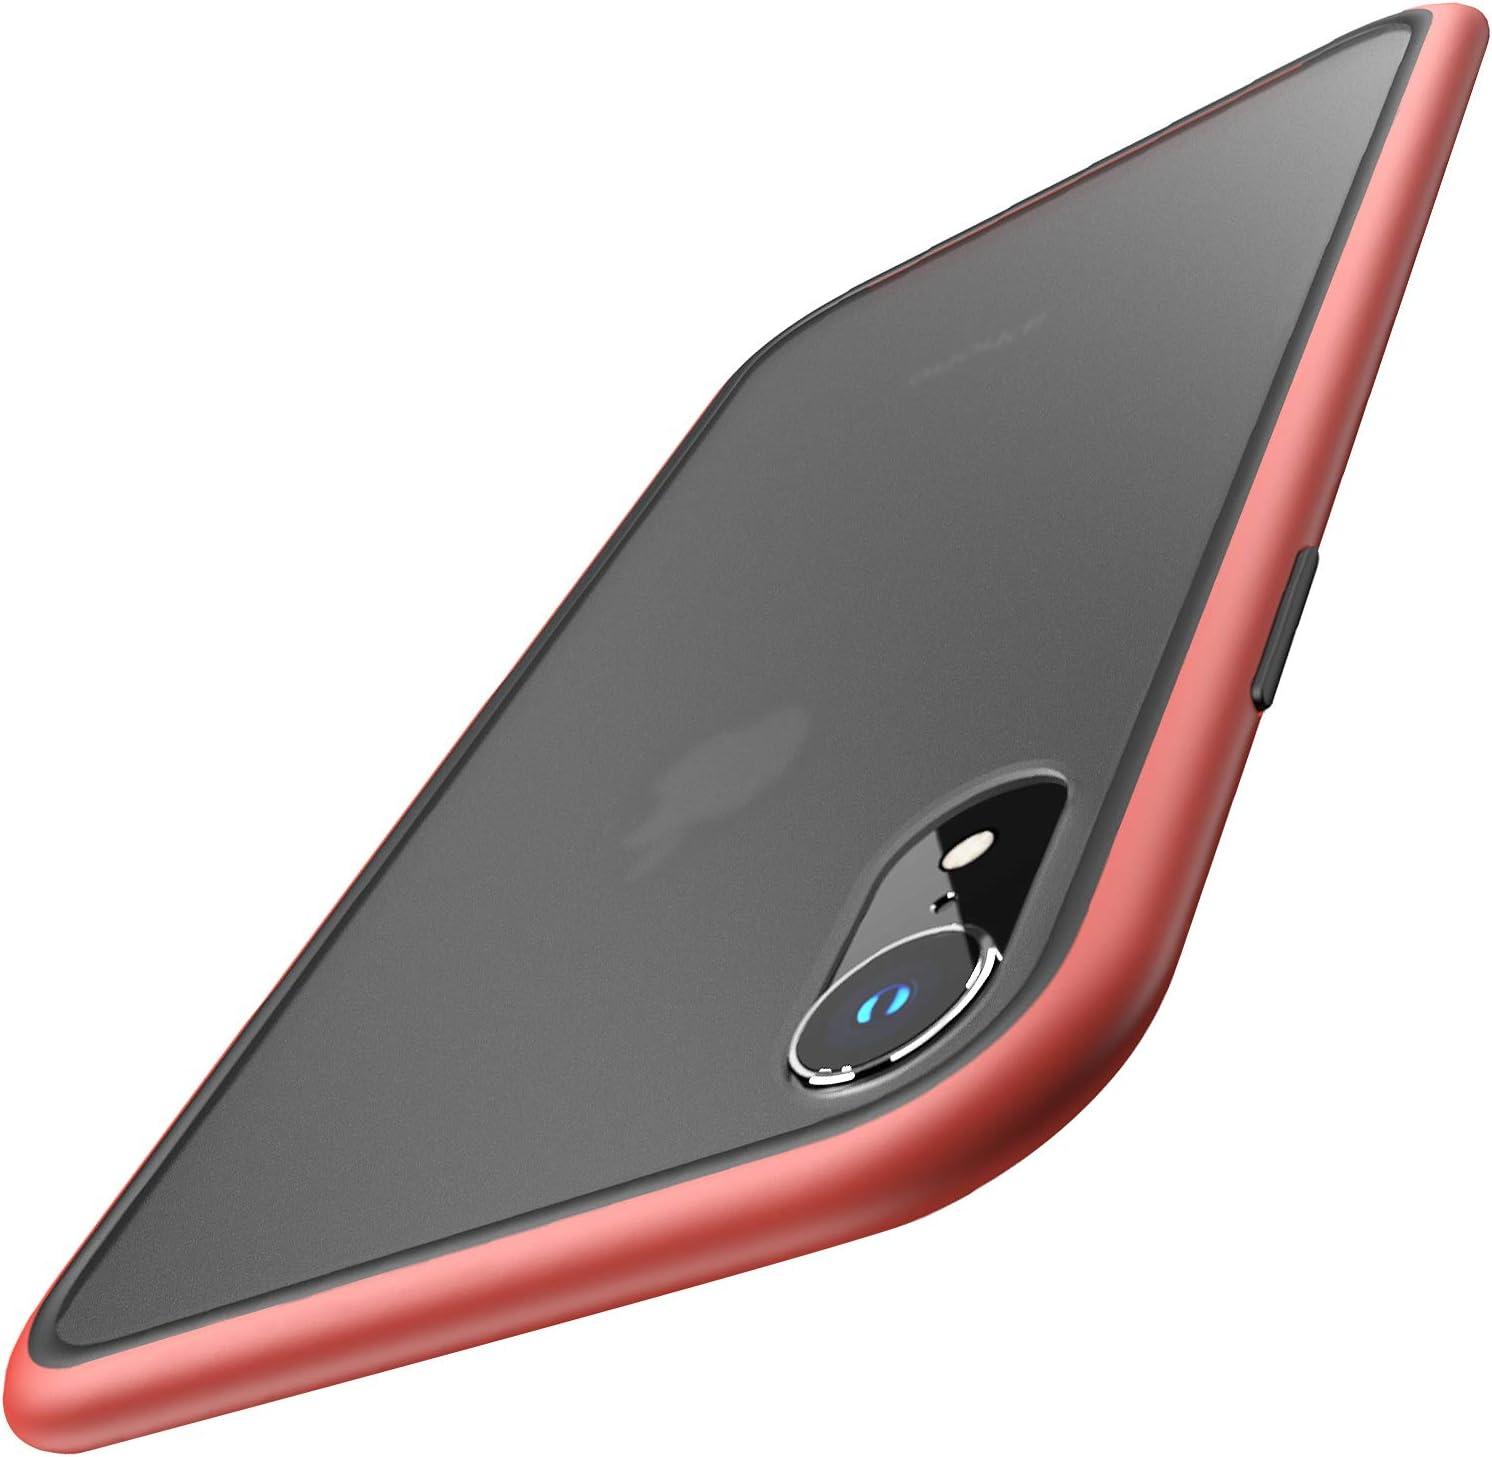 TOZO for iPhone XR Case Phantom Hybrid Soft Grip Matte Finish Frame Matte Back Panel Cover for iPhone XR 6.1 Inch 2018 (Red)